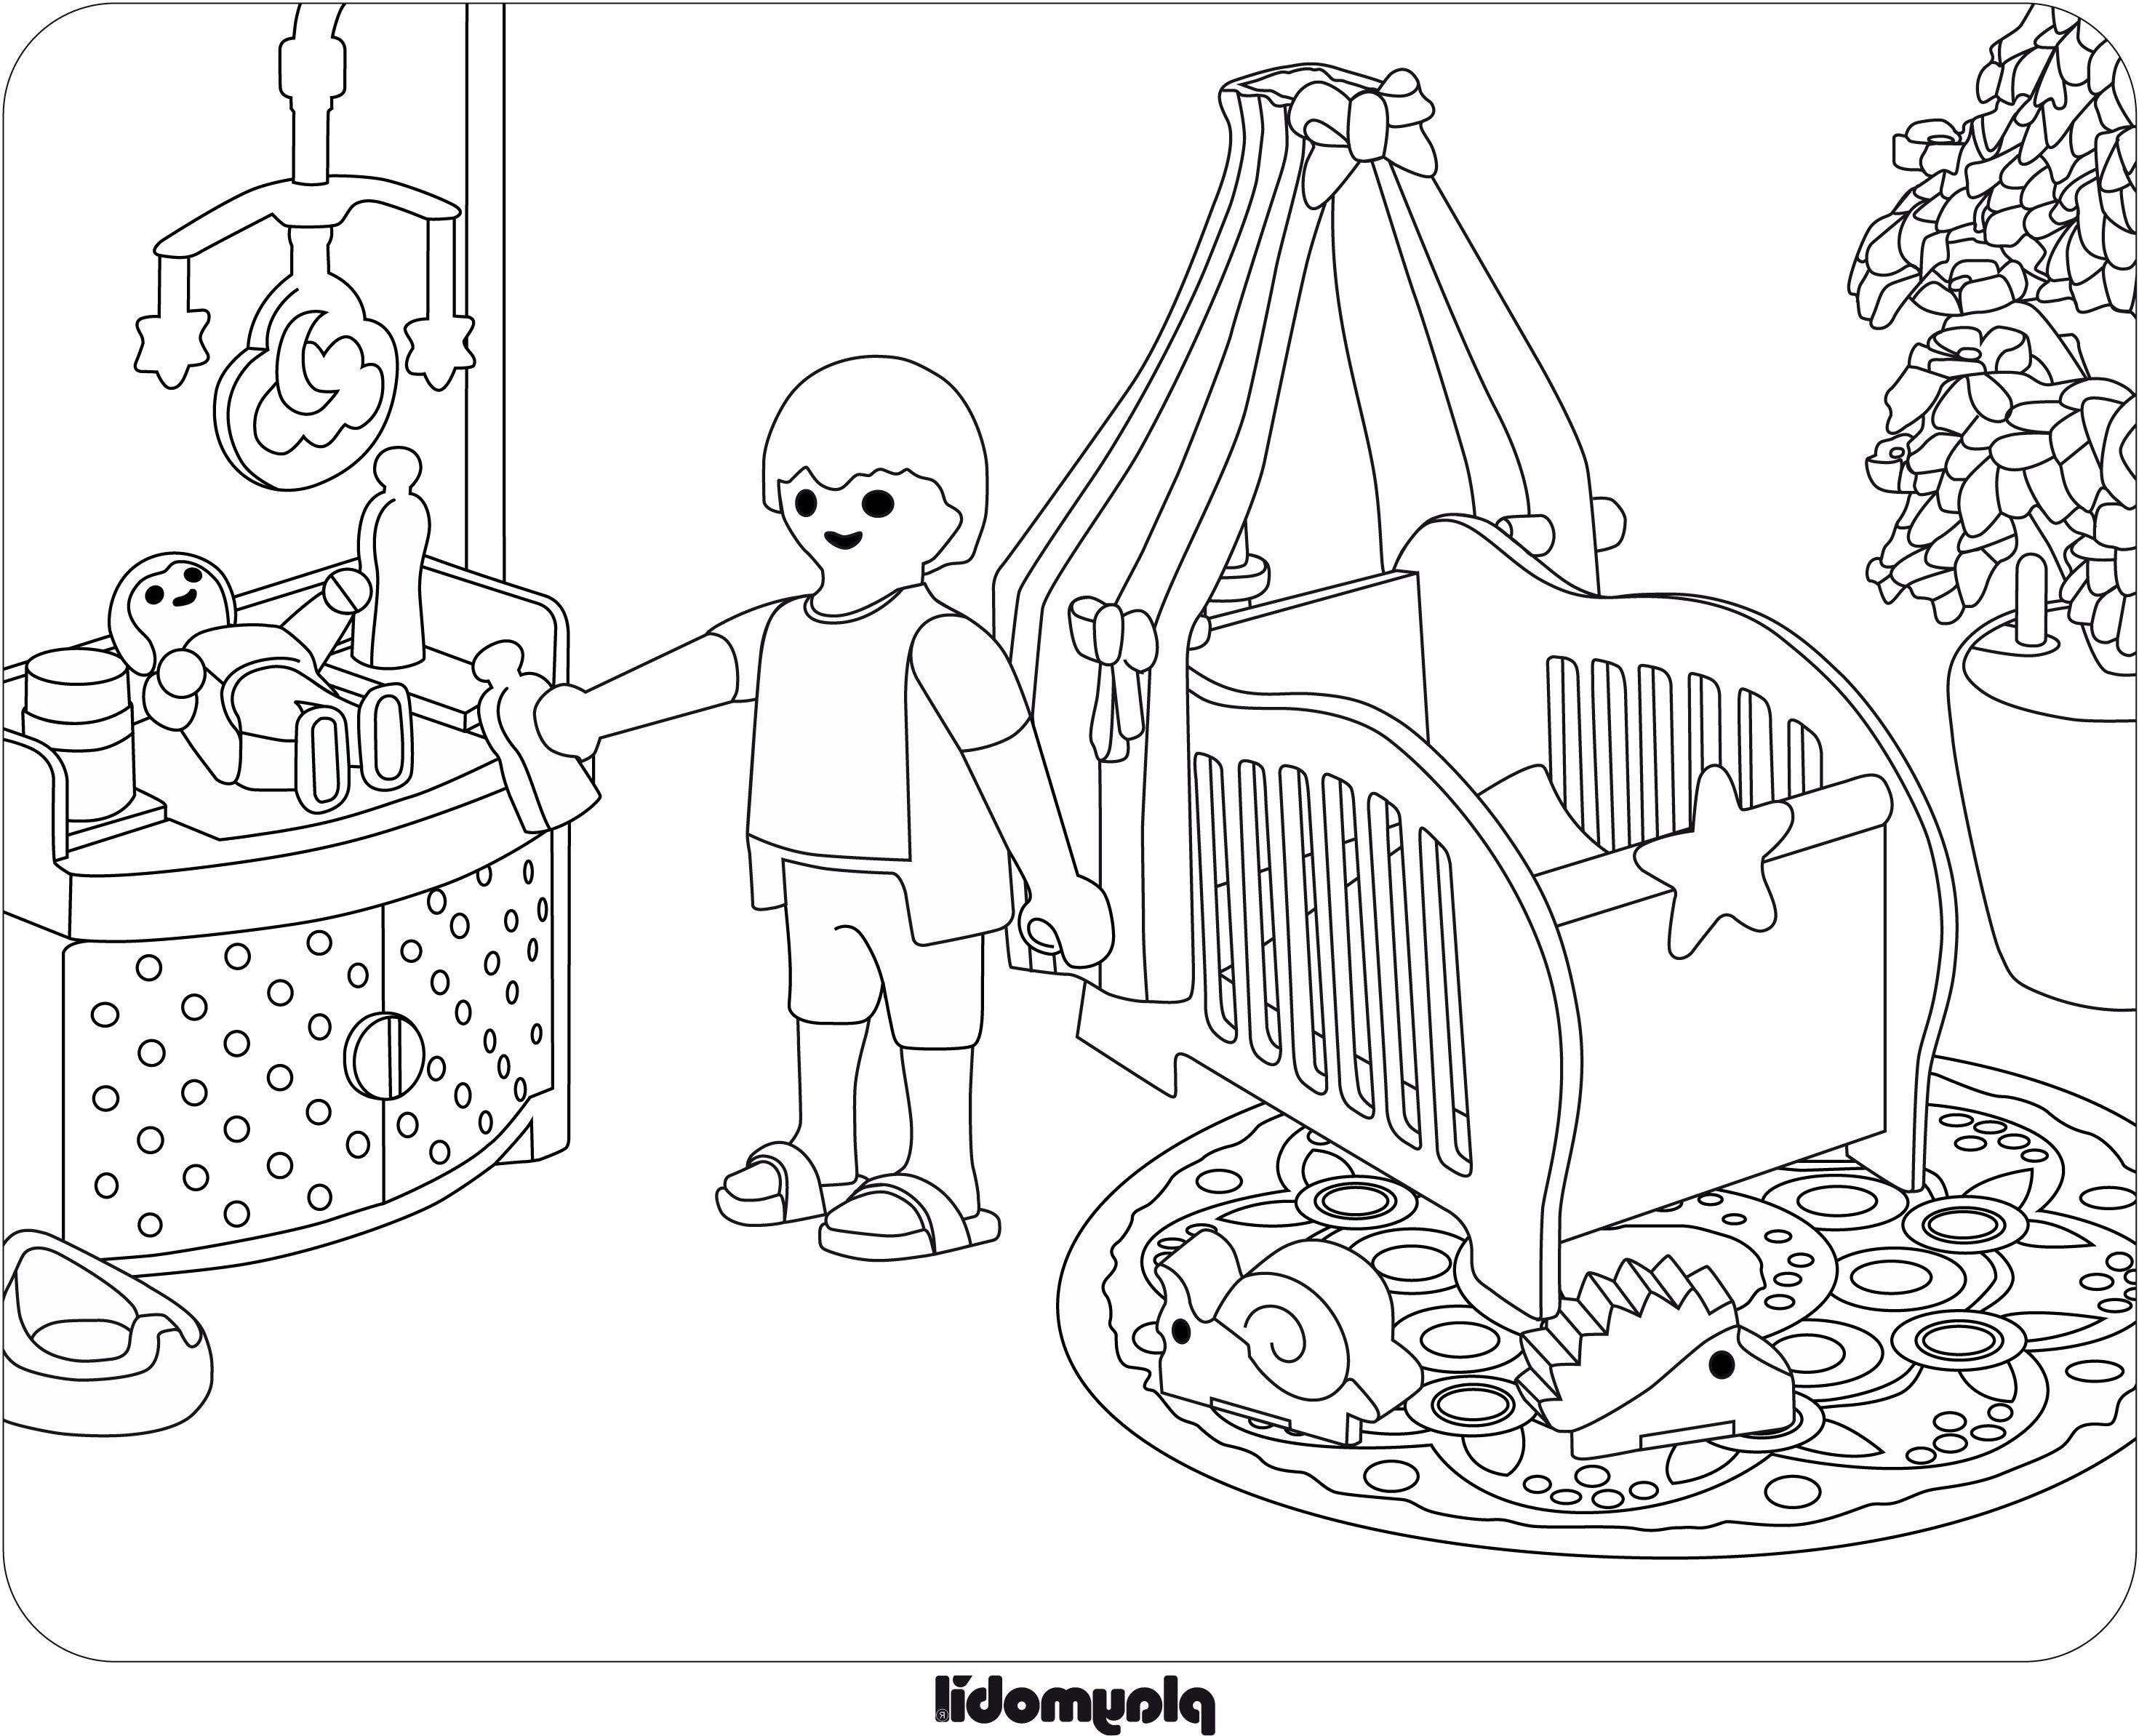 playmobil ausmalbilder k he | aiquruguay